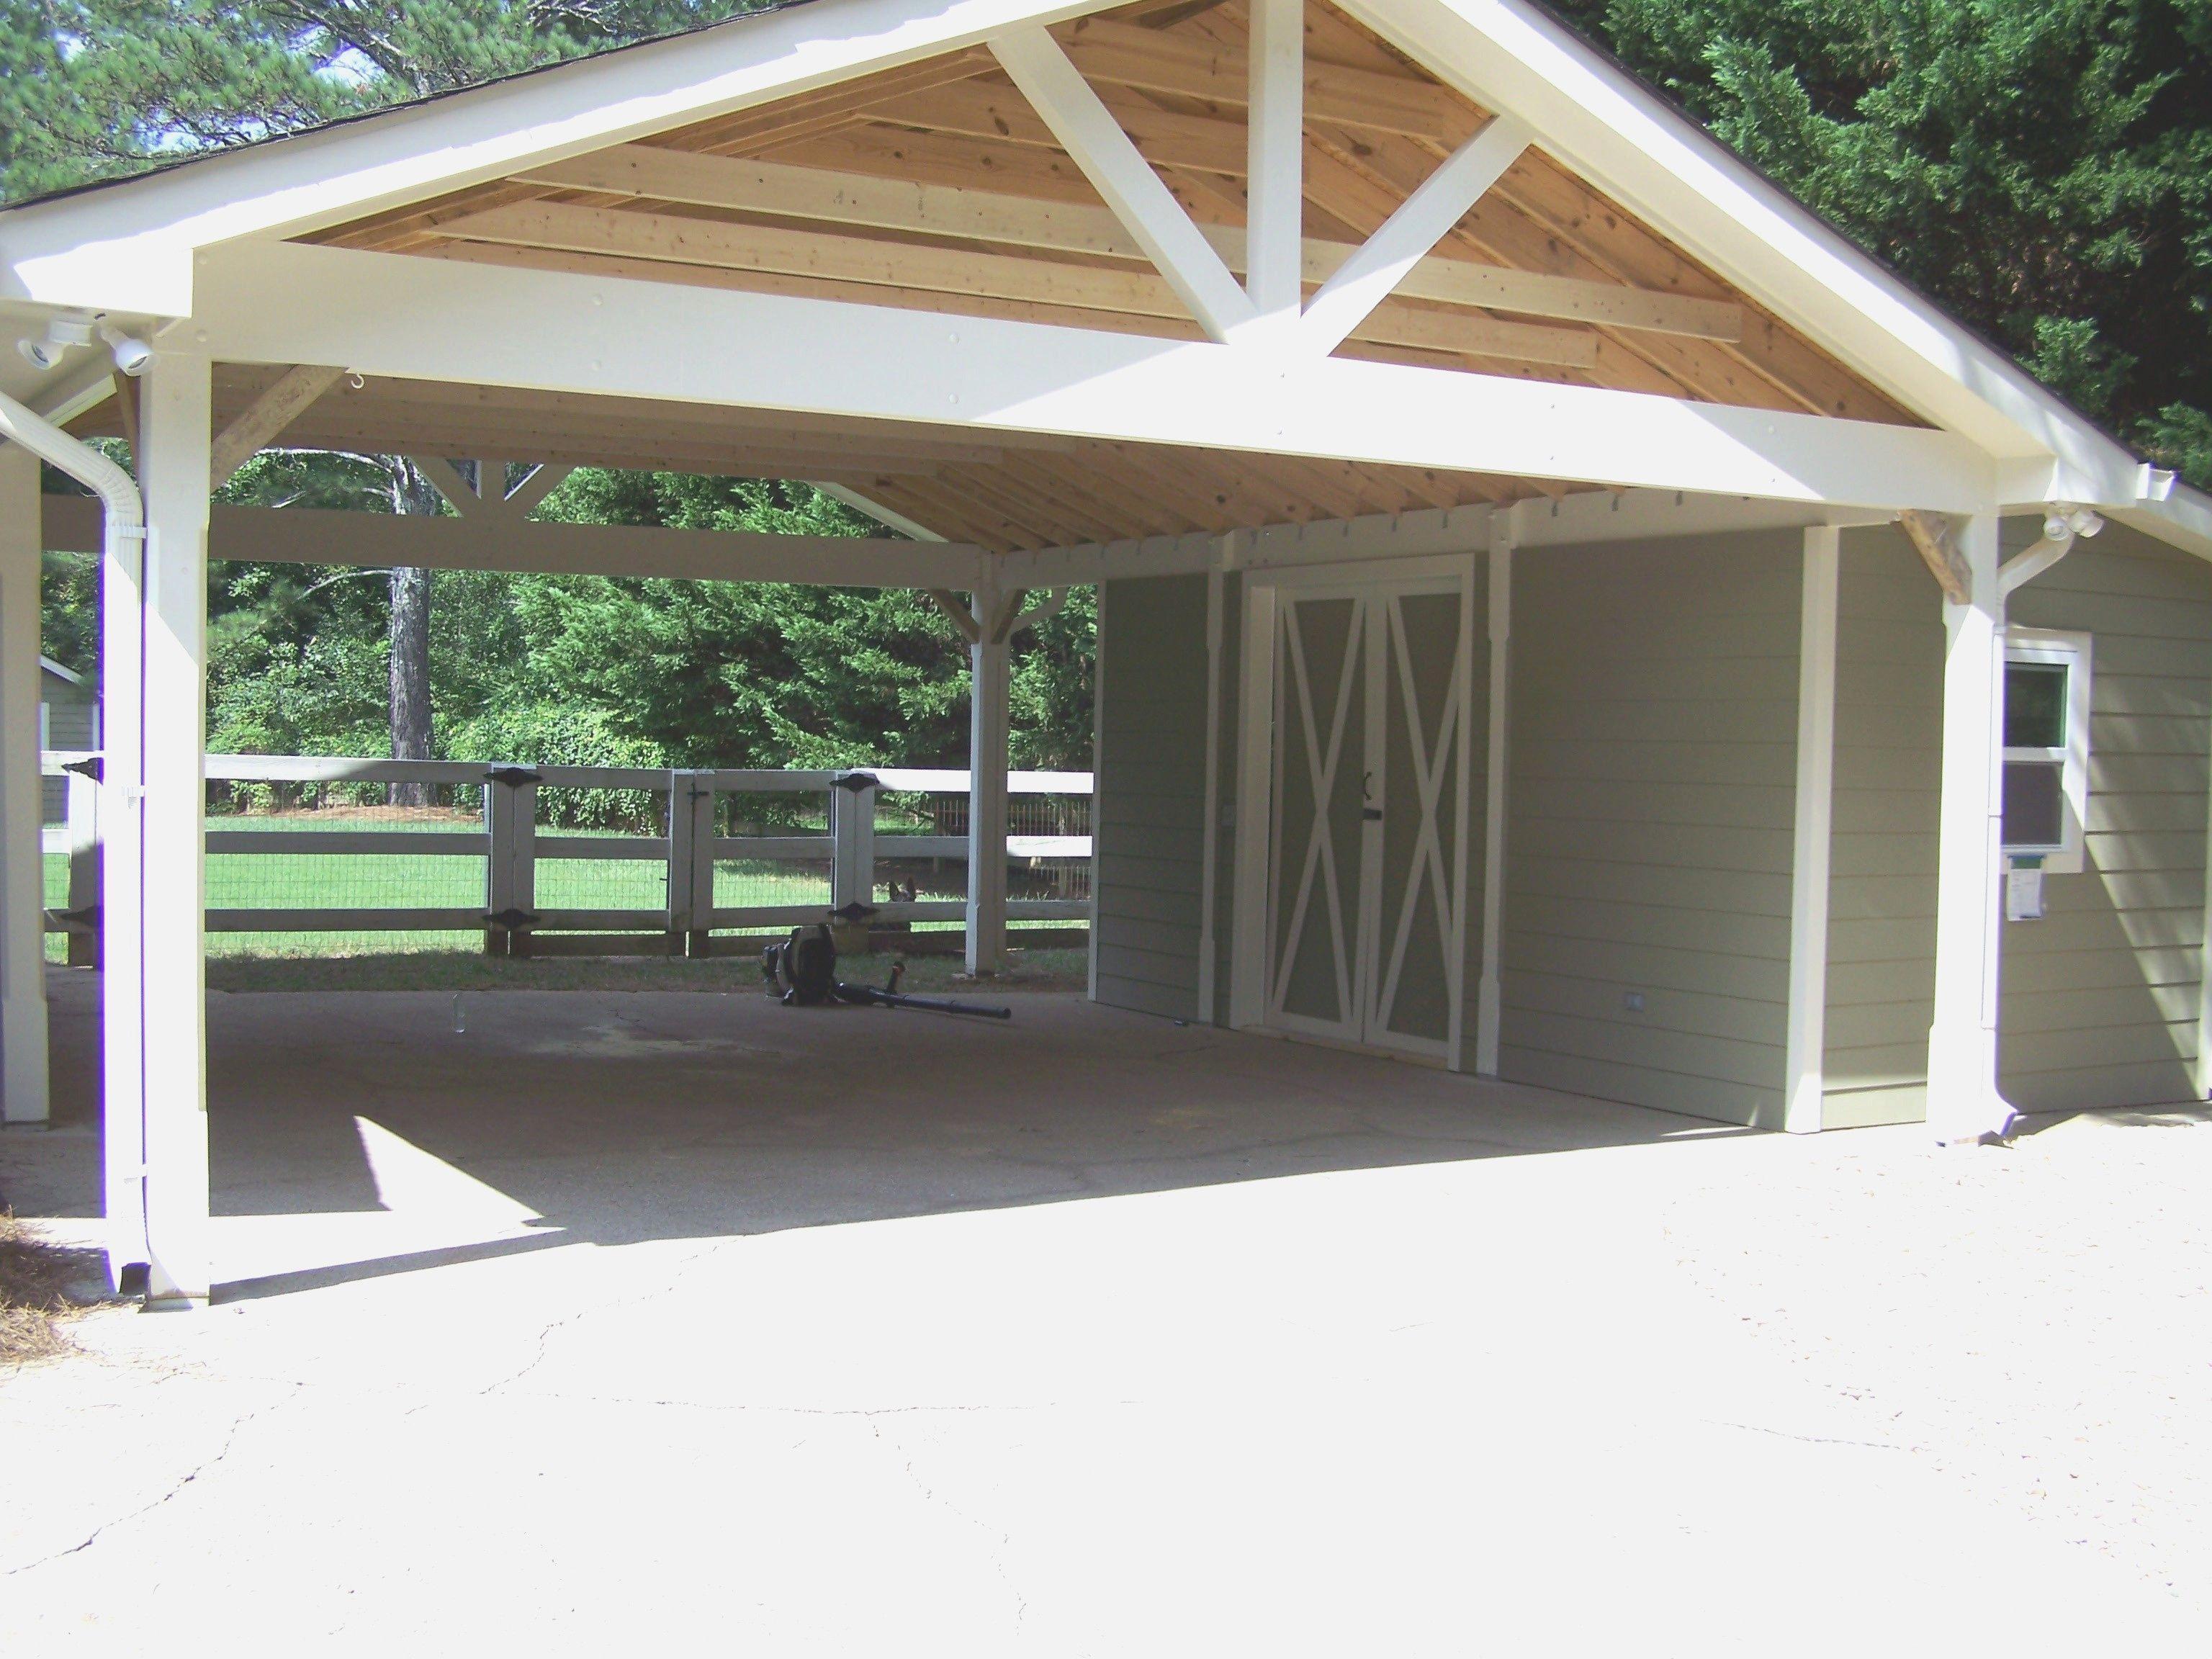 Carport Ideas Alphatravelvn Com Building A Carport House